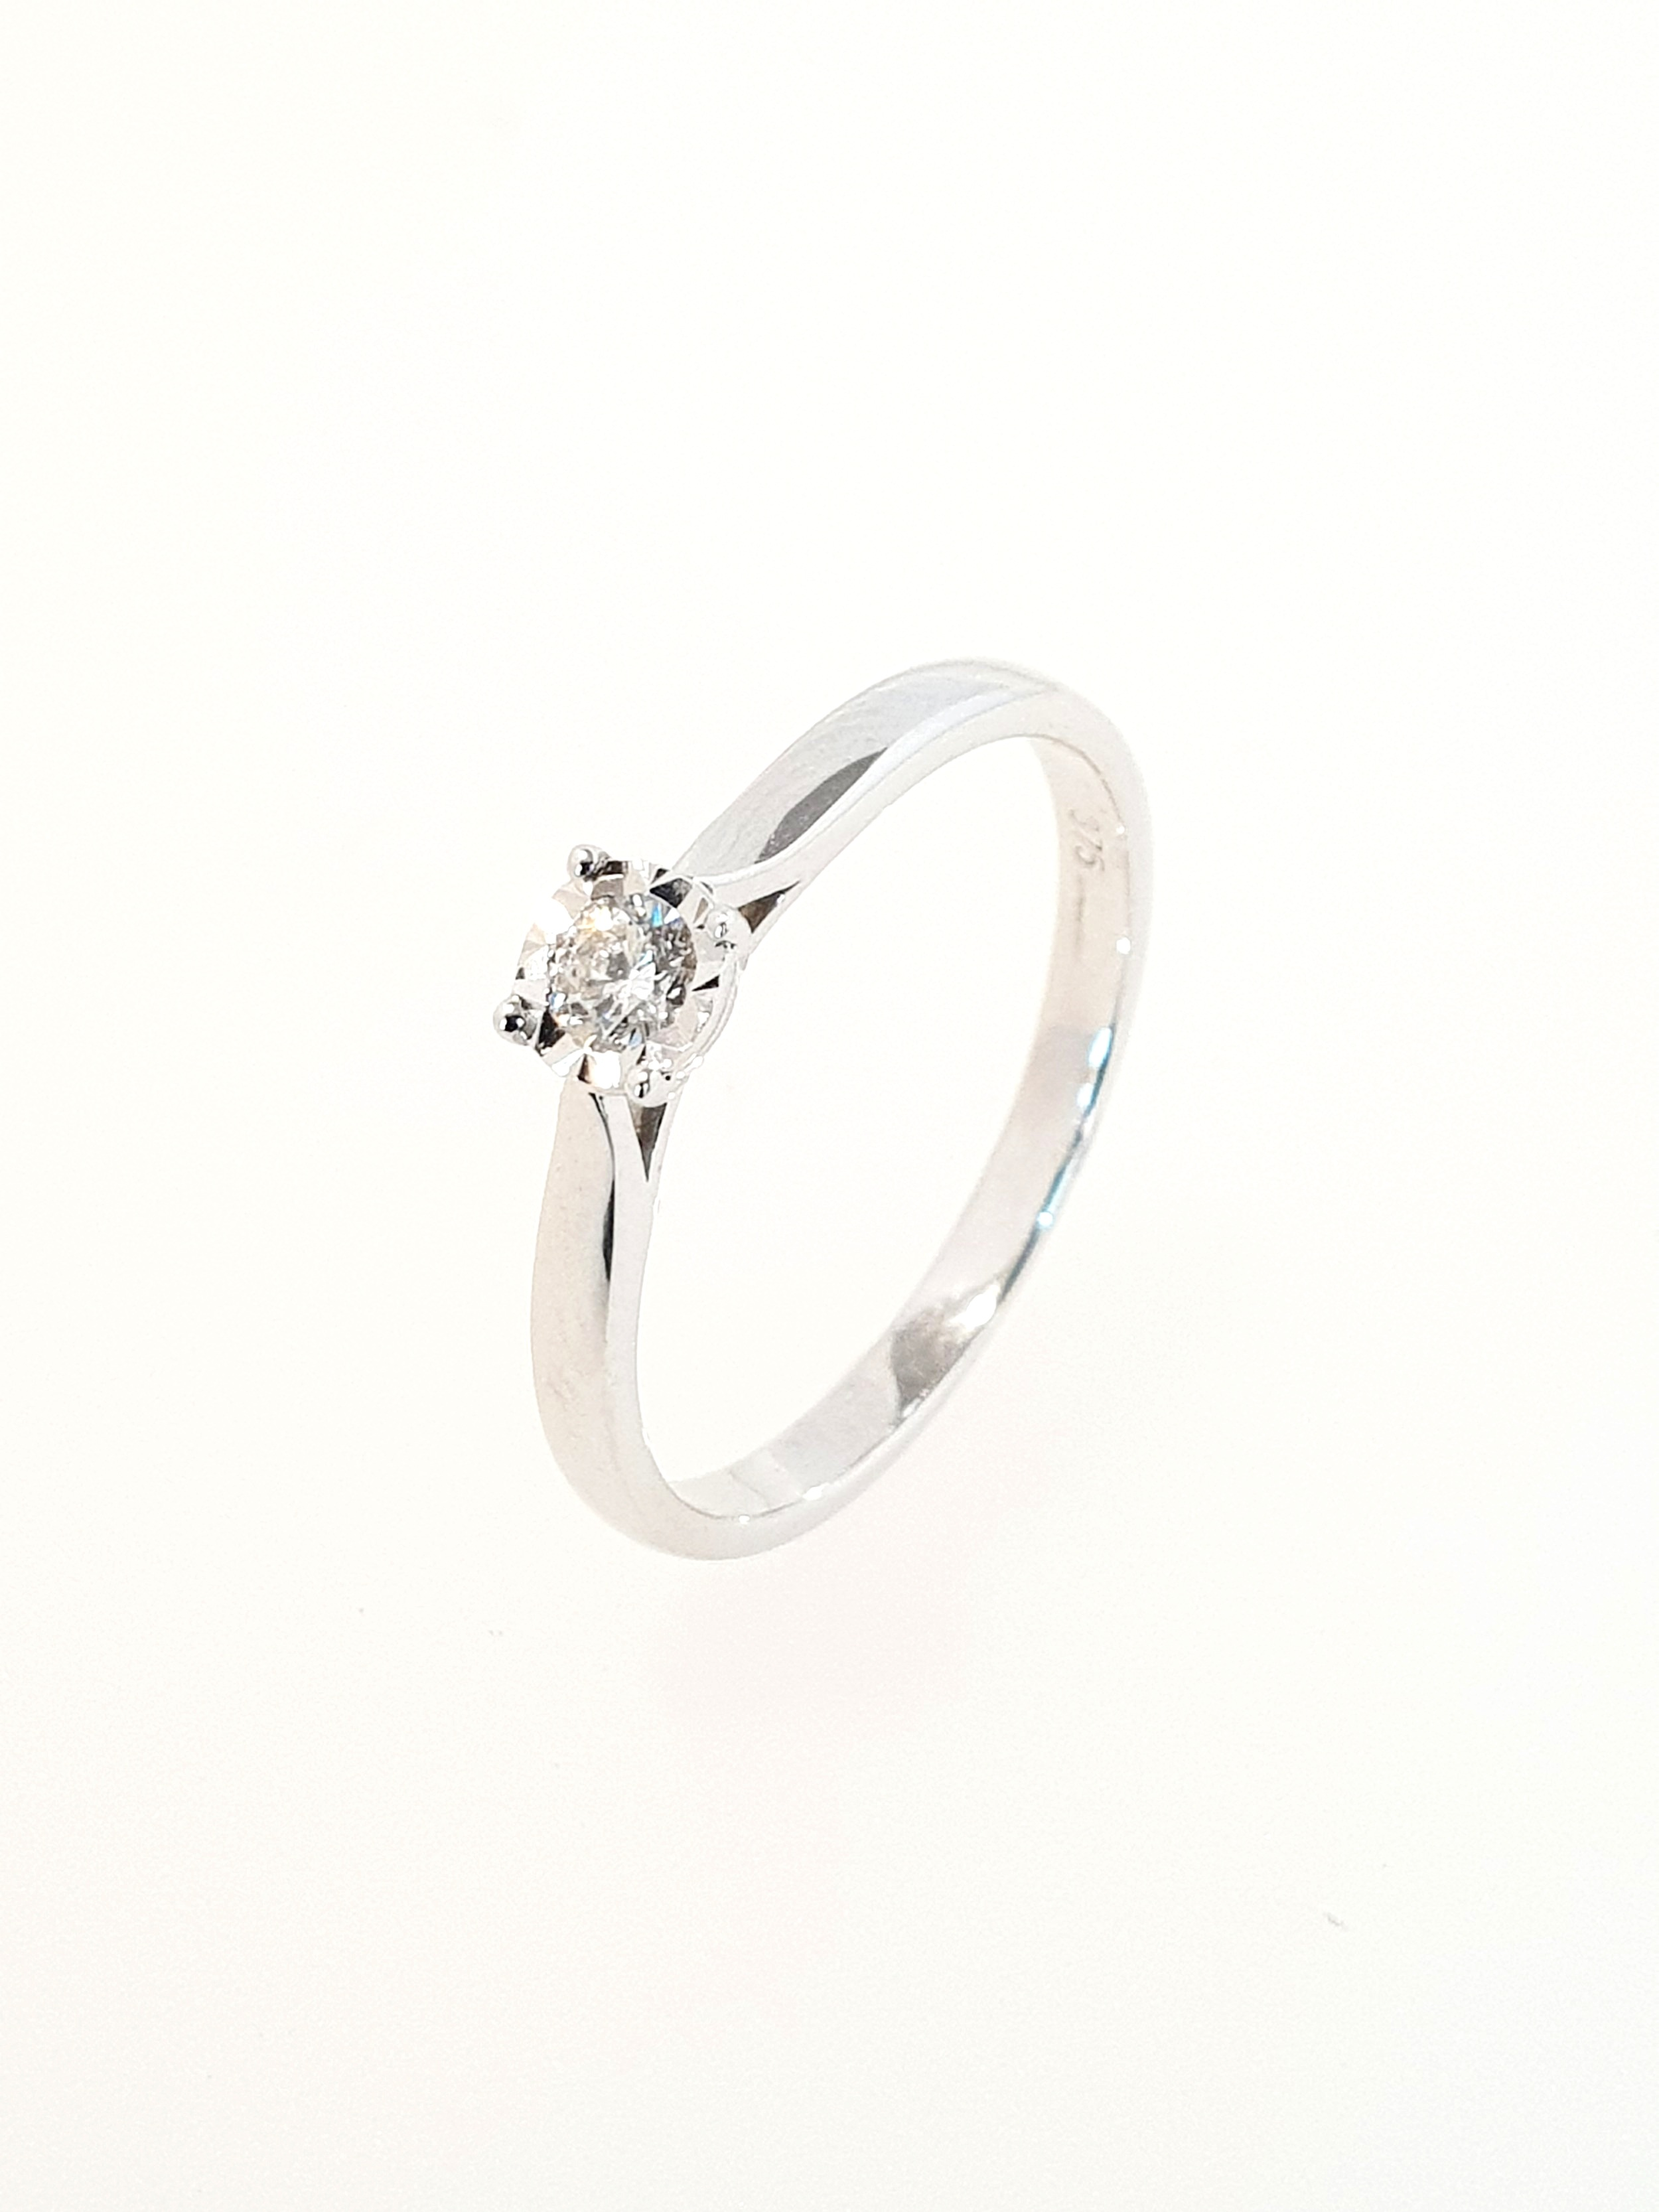 9ct White Gold DIamond Illusion Ring  .05ct  Stock Code: G1955  £400